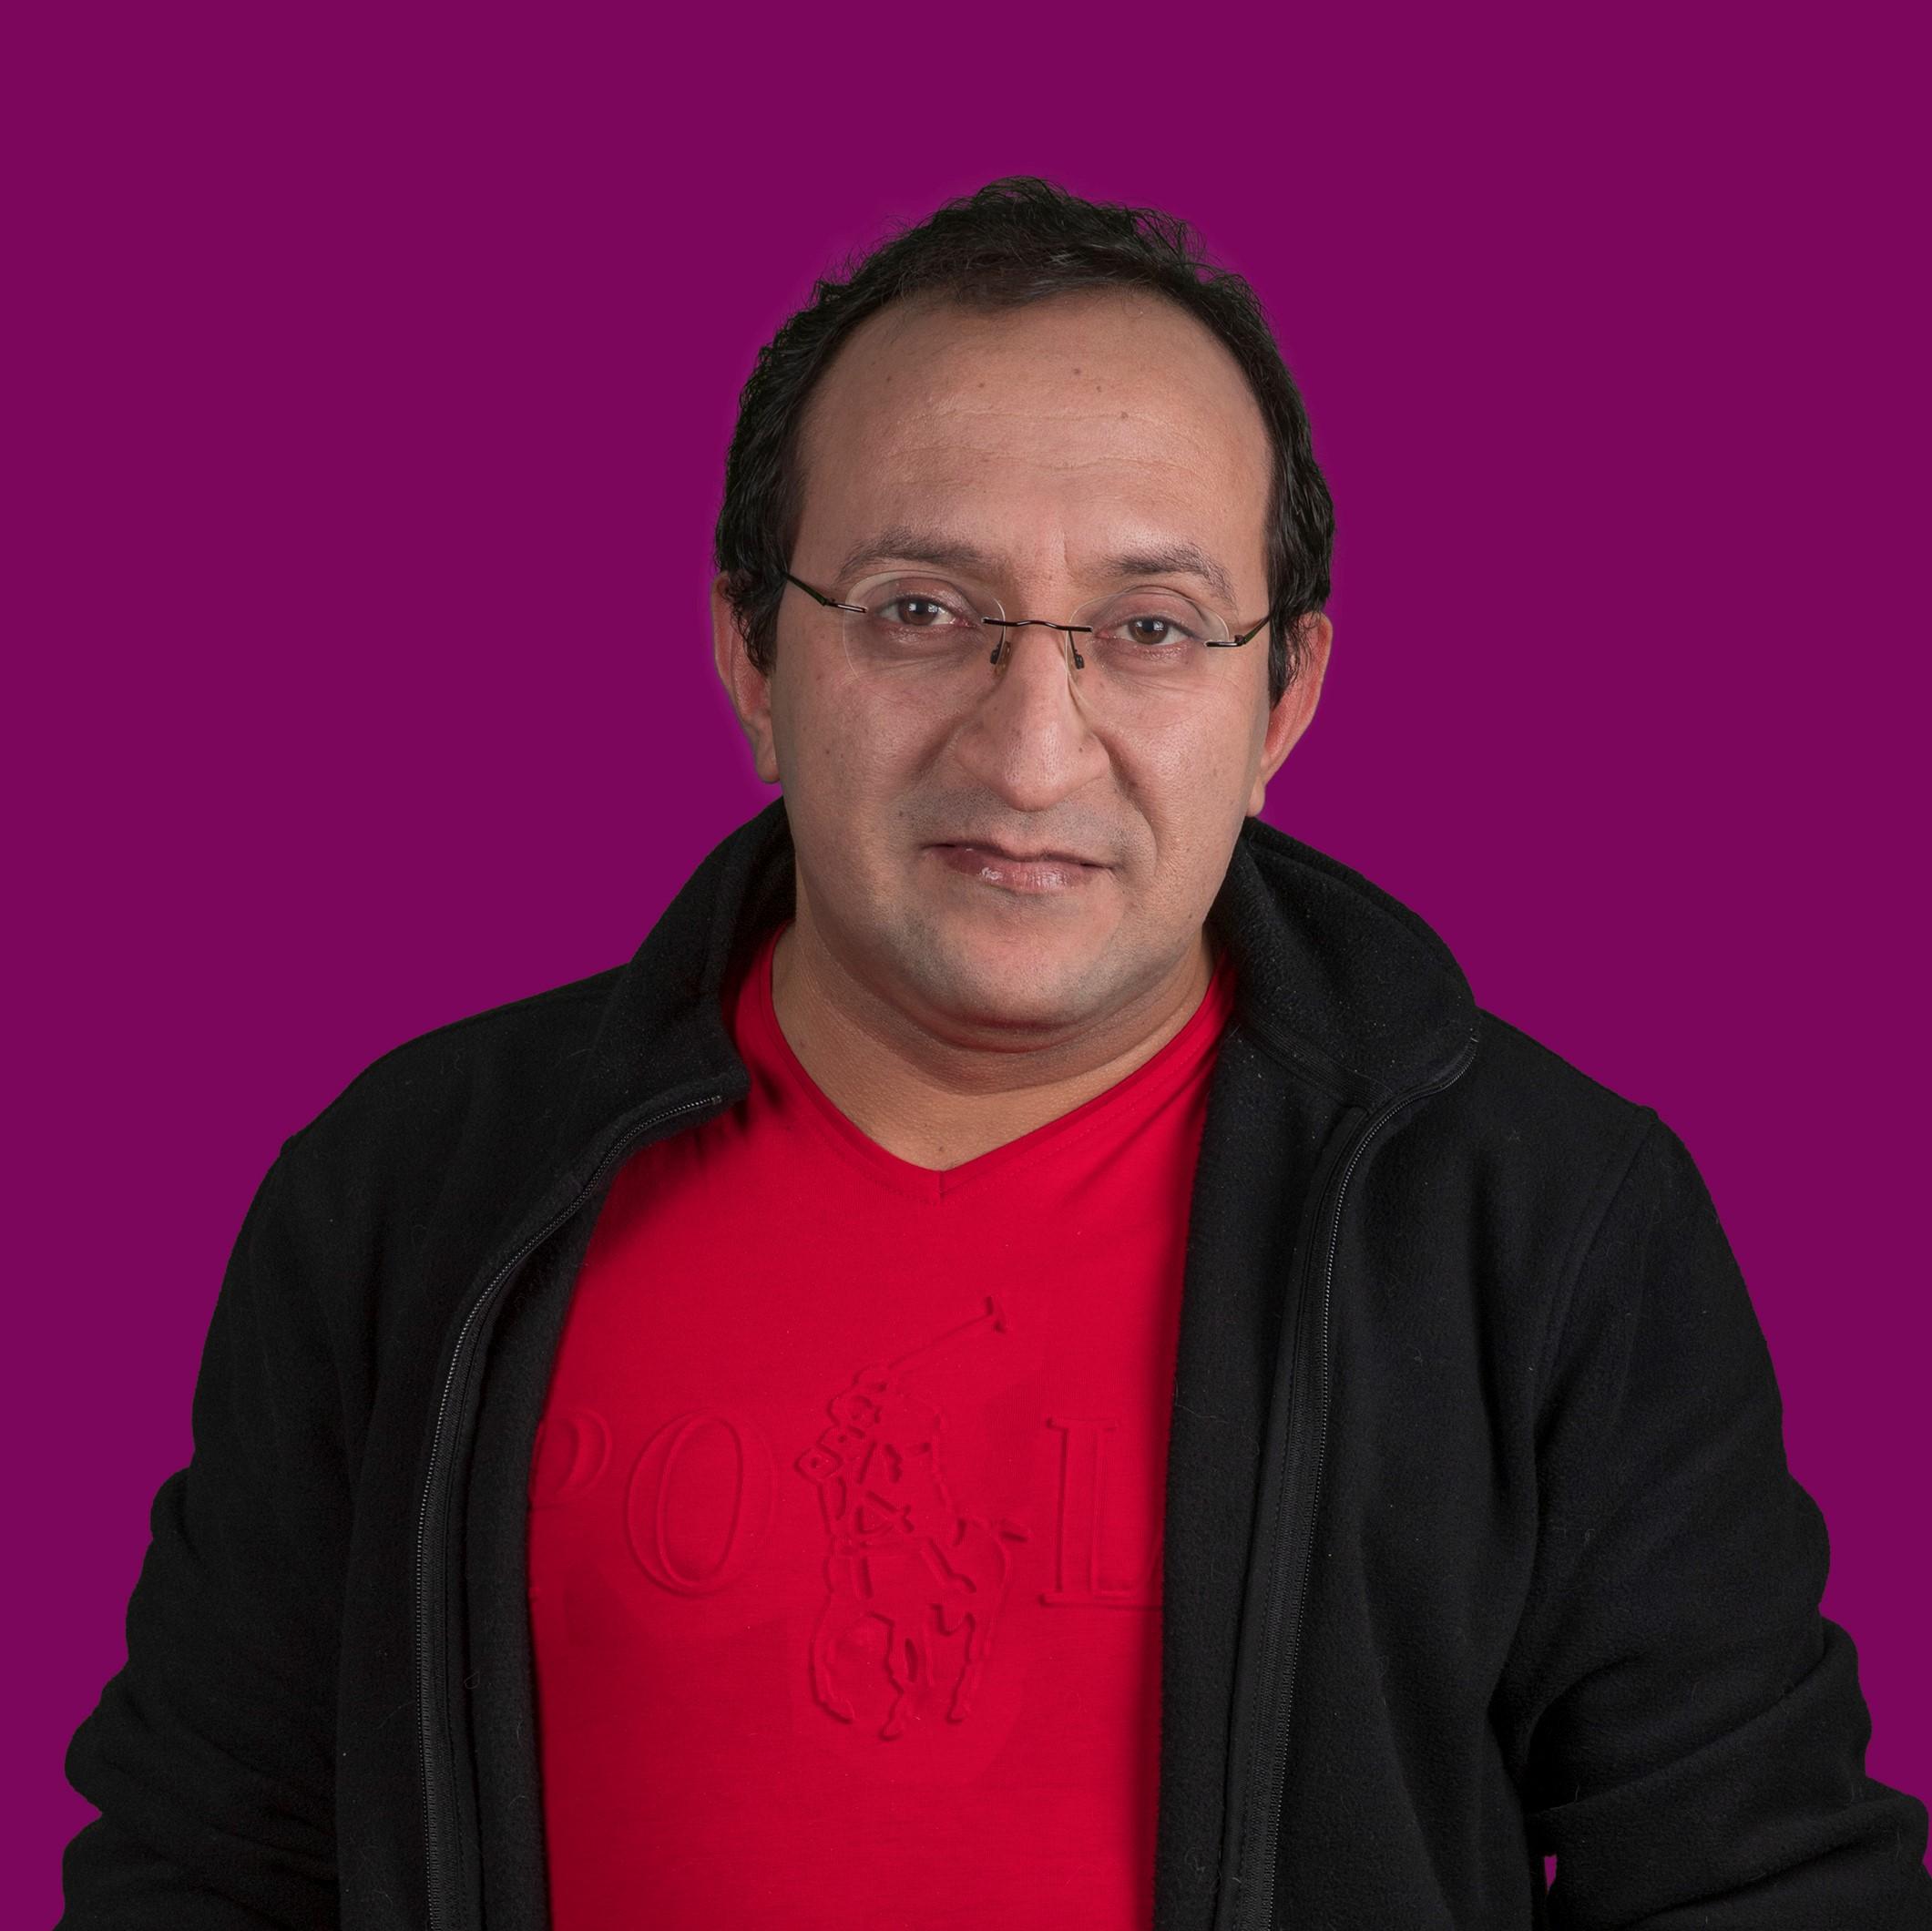 20. Omar KHAOUCHI